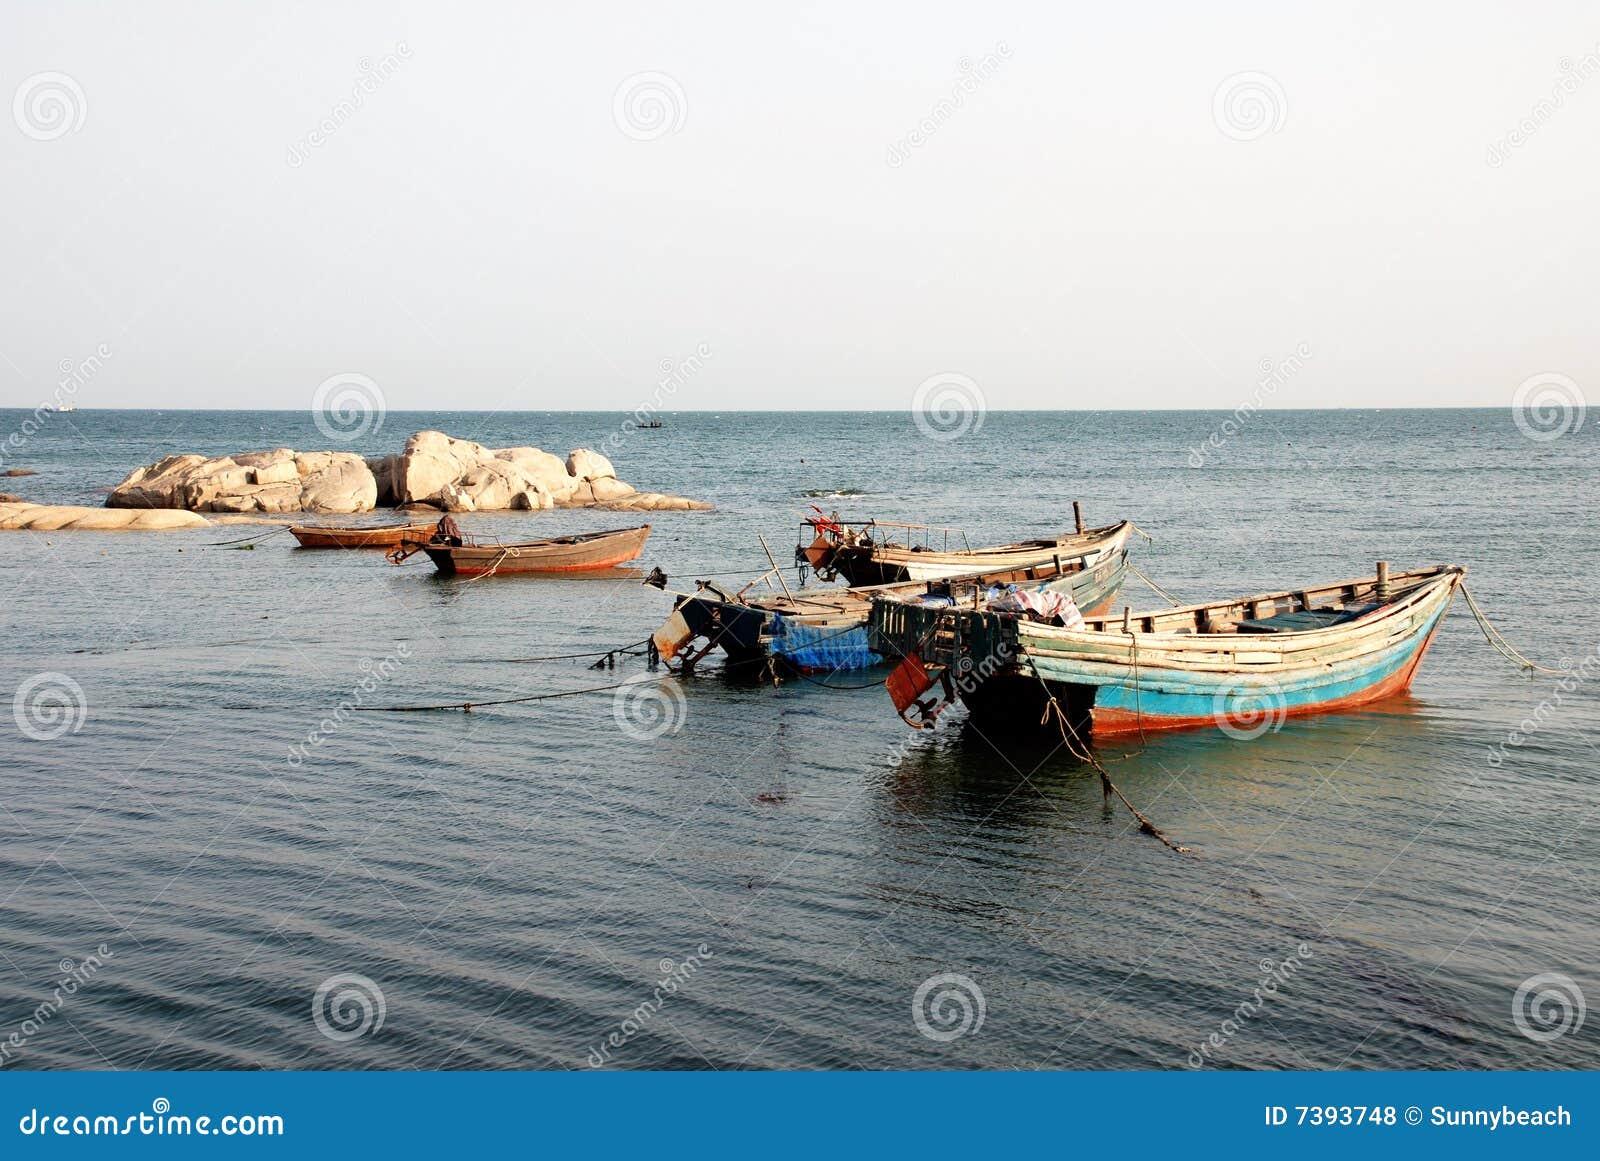 Fishing boats royalty free stock photos image 7393748 for Free fishing boats